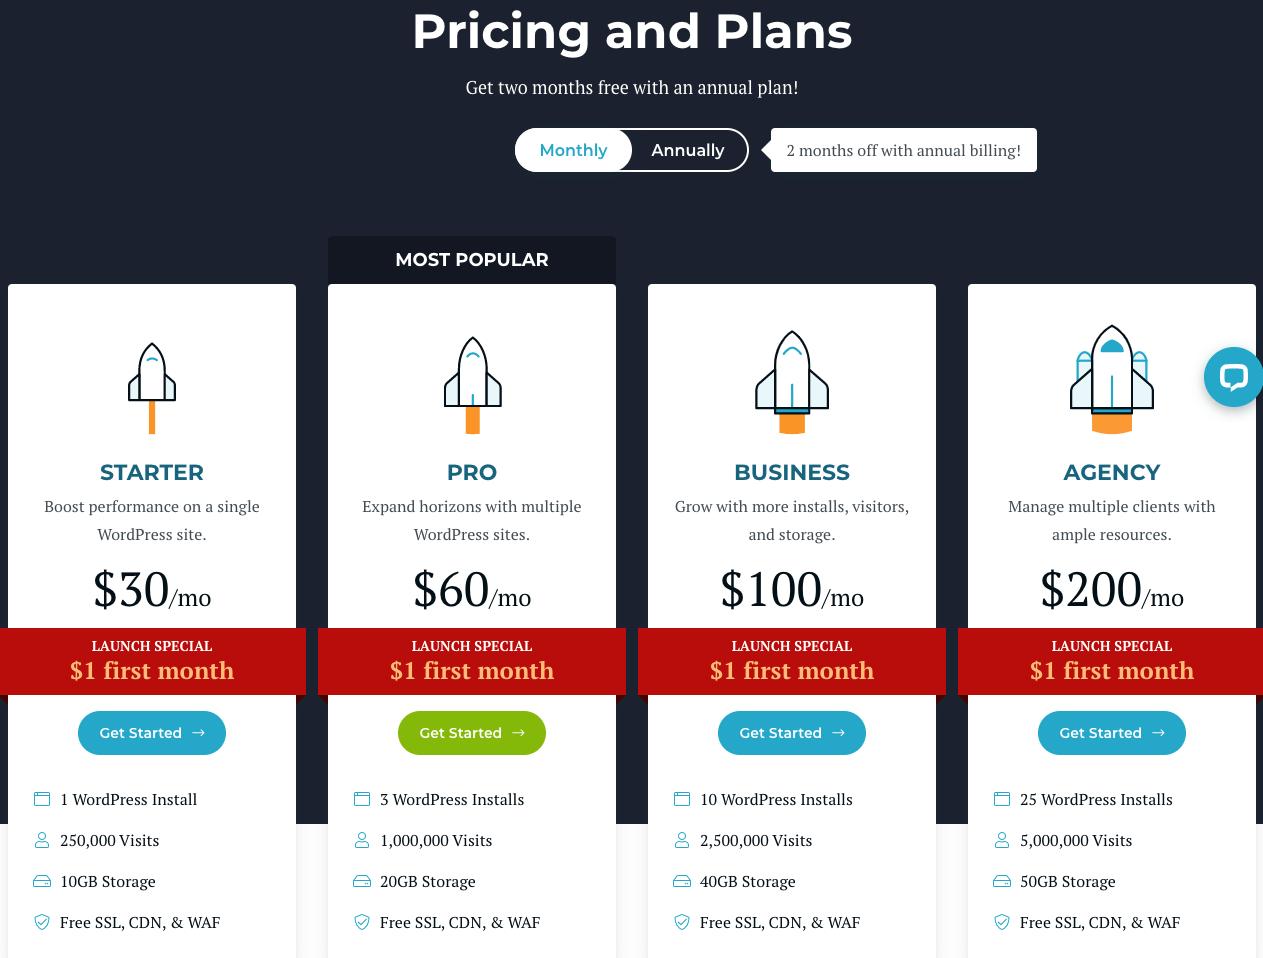 Rocket.Net pricing